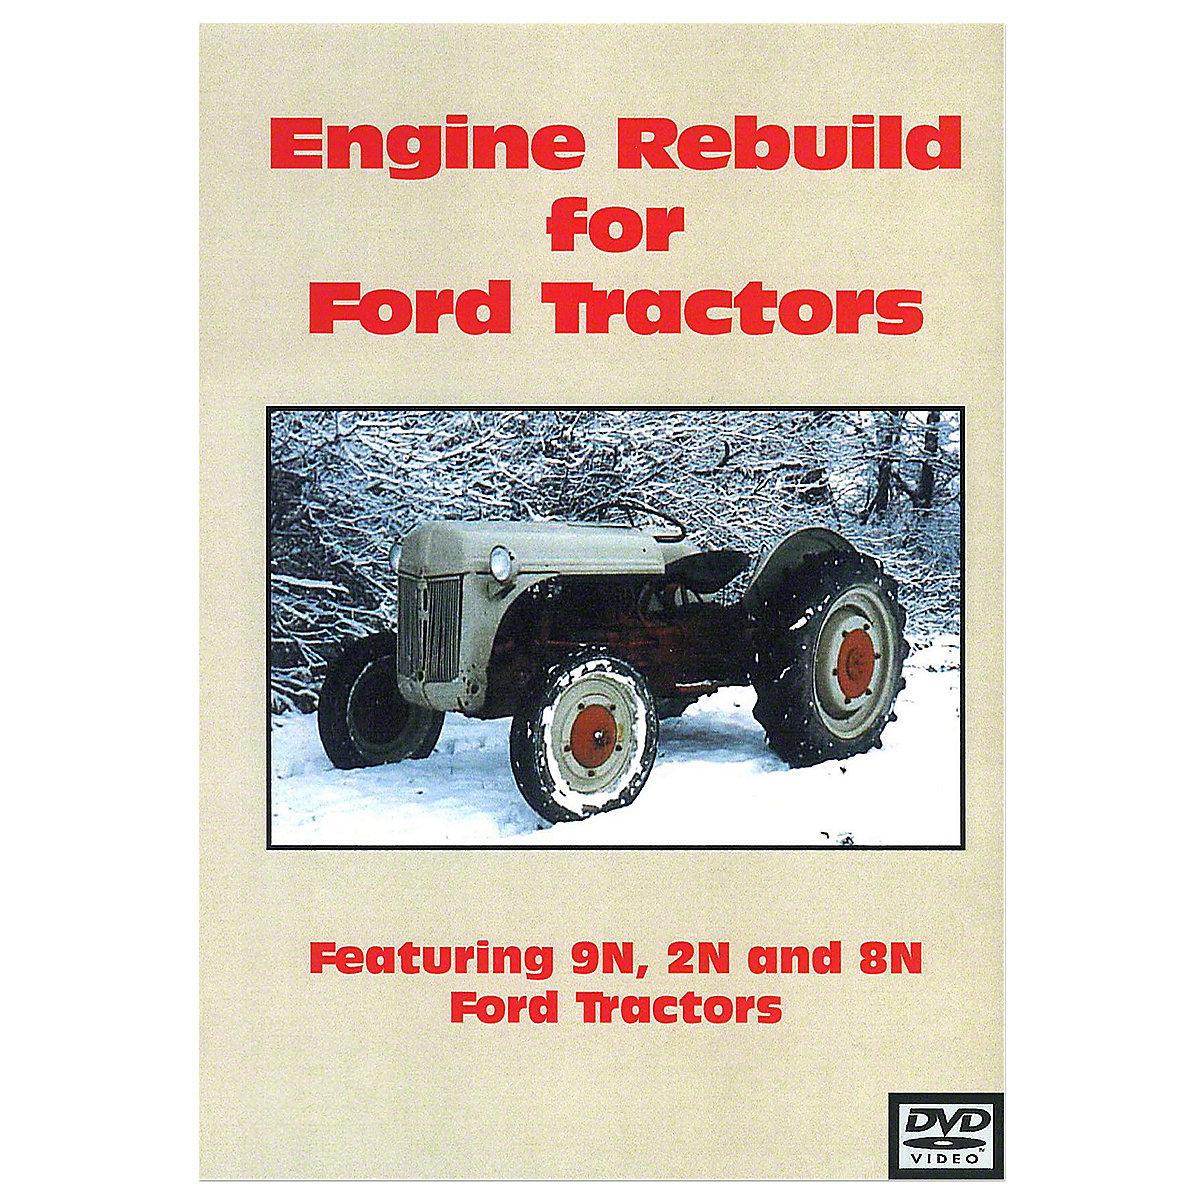 Bok040 Ford 8n Operators Manual Repr Engine Diagram 9n 2n Rebuild Video Dvd